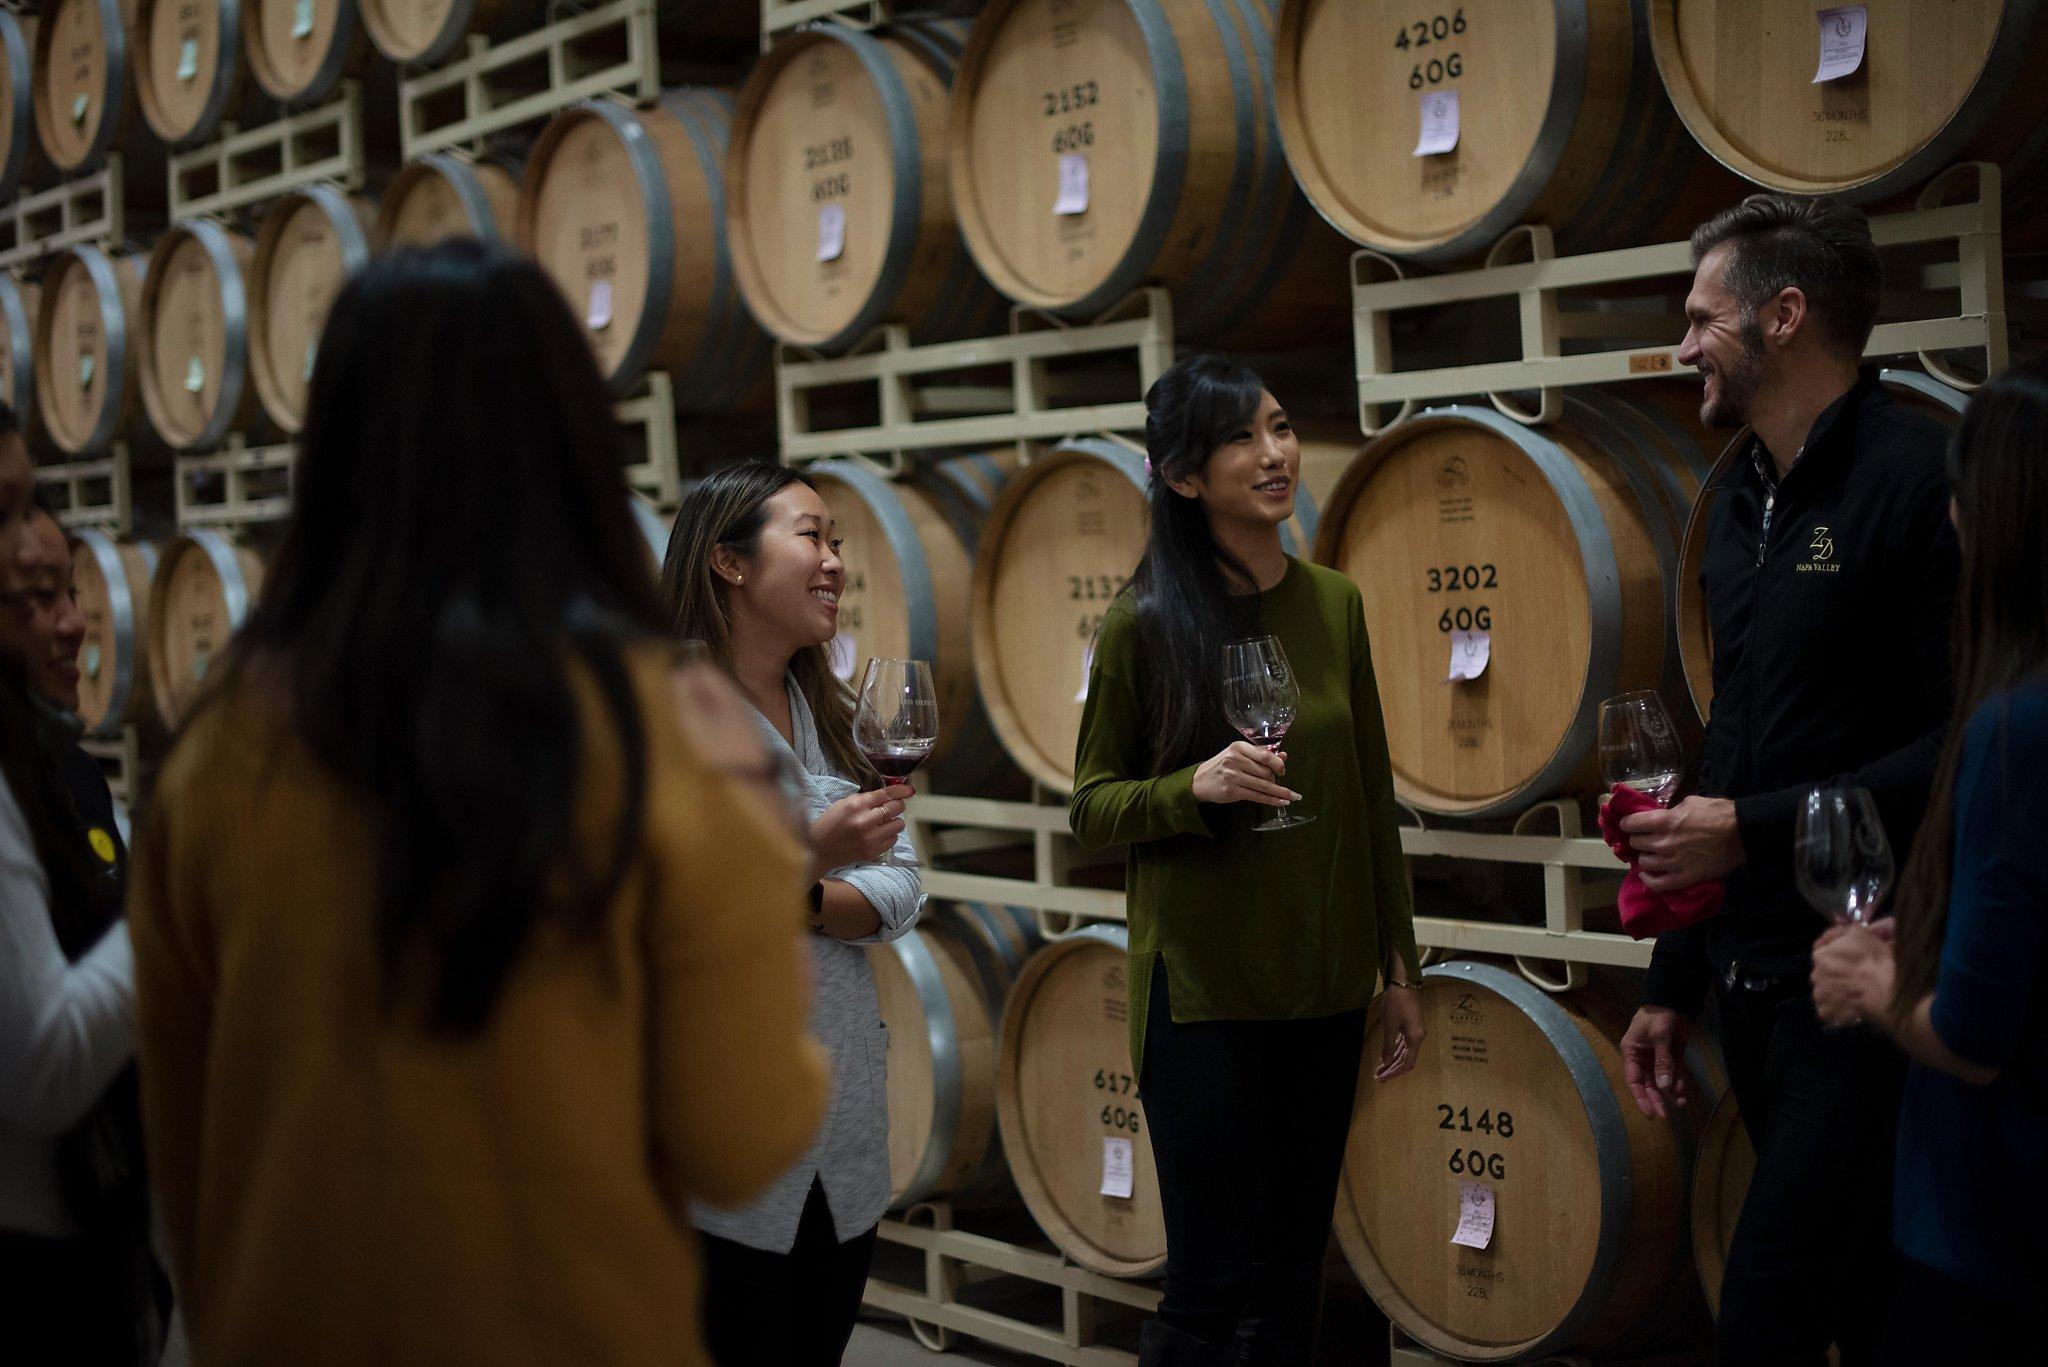 Zd Wines Plans An Extensive Renovation photo